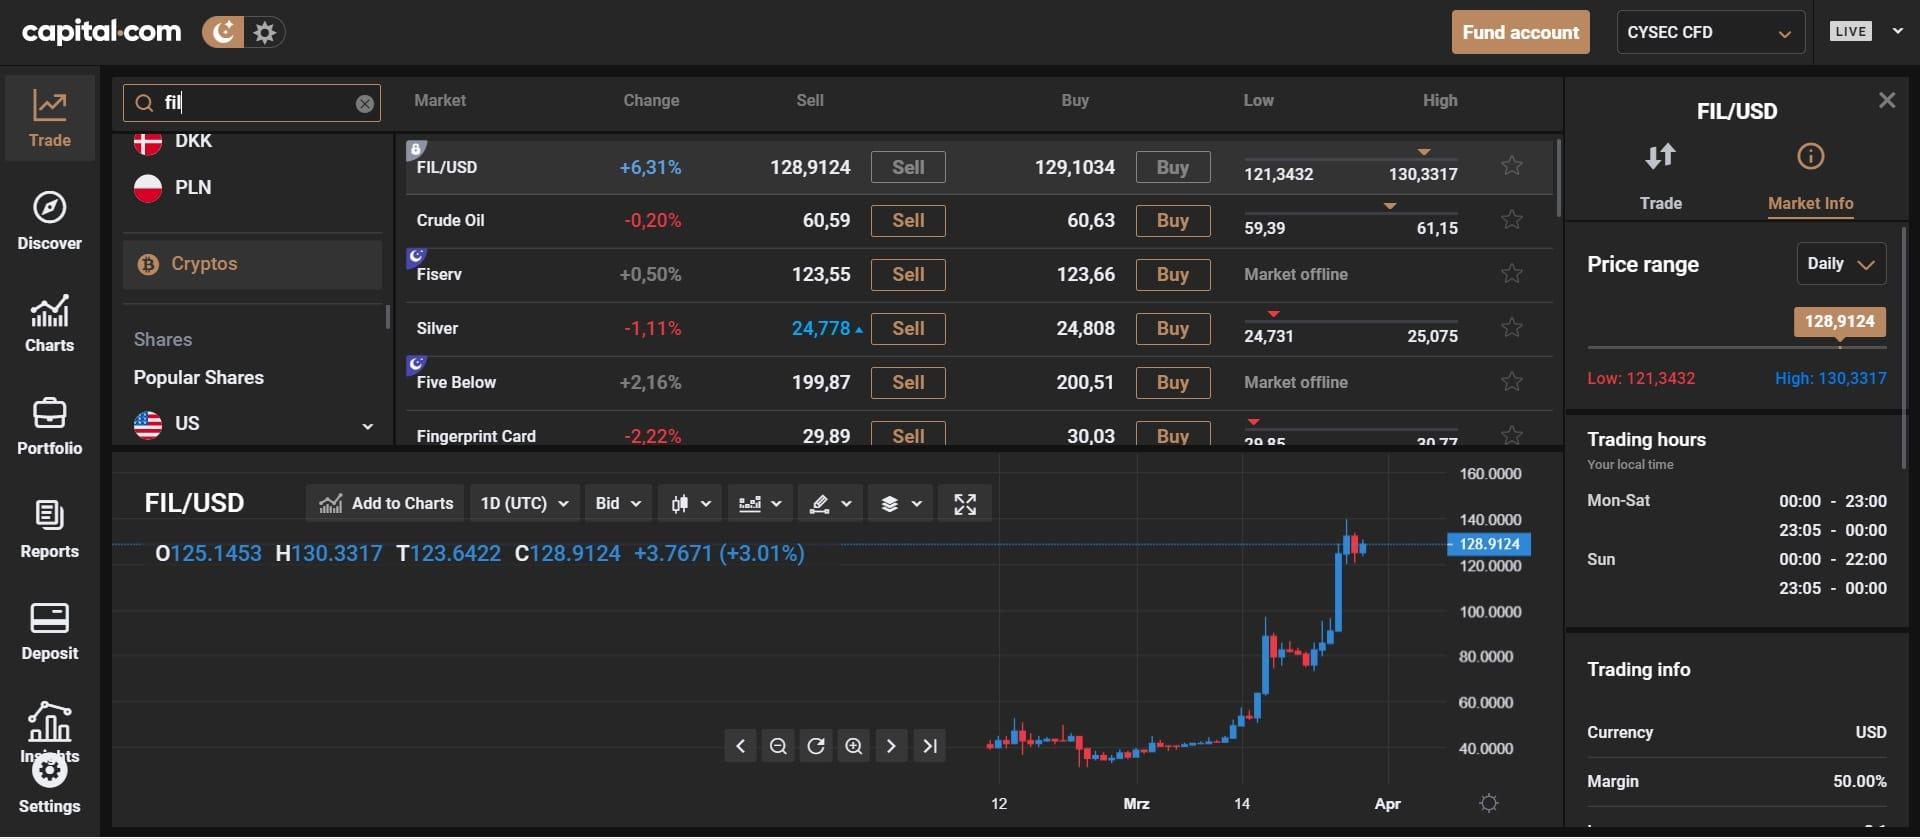 Filecoin-kaufen-Capital